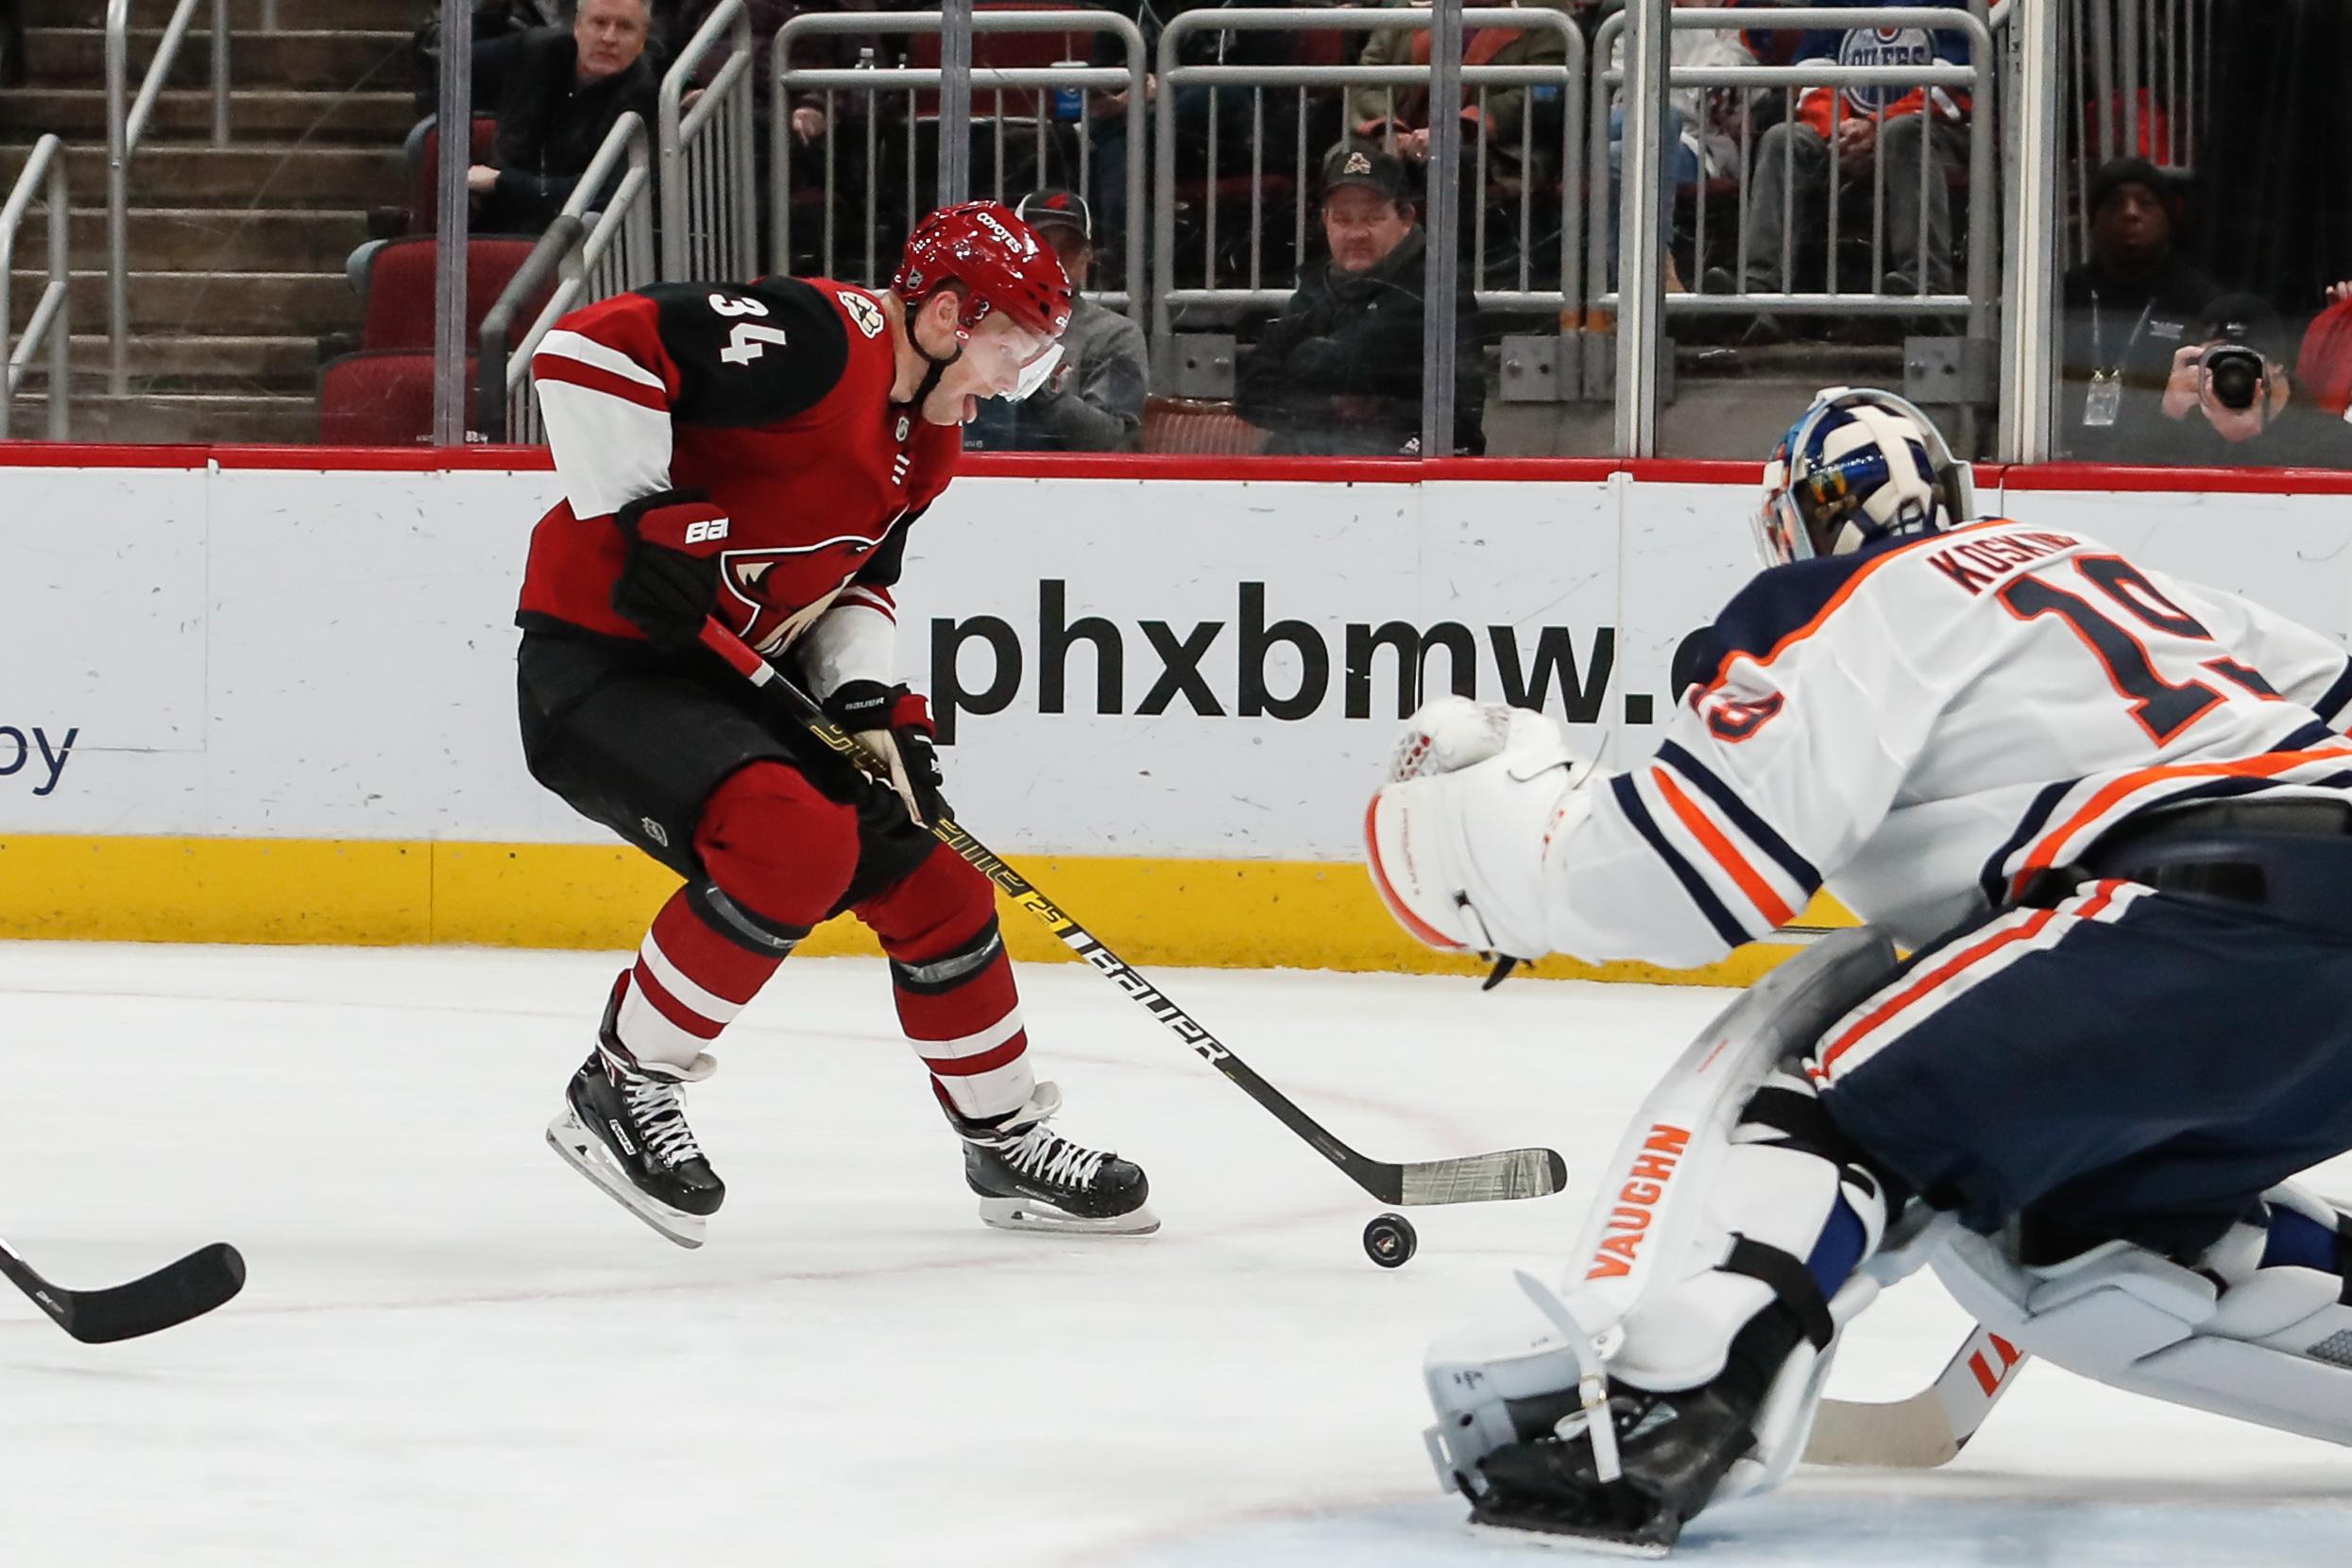 NHL: FEB 04 Oilers at Coyotes